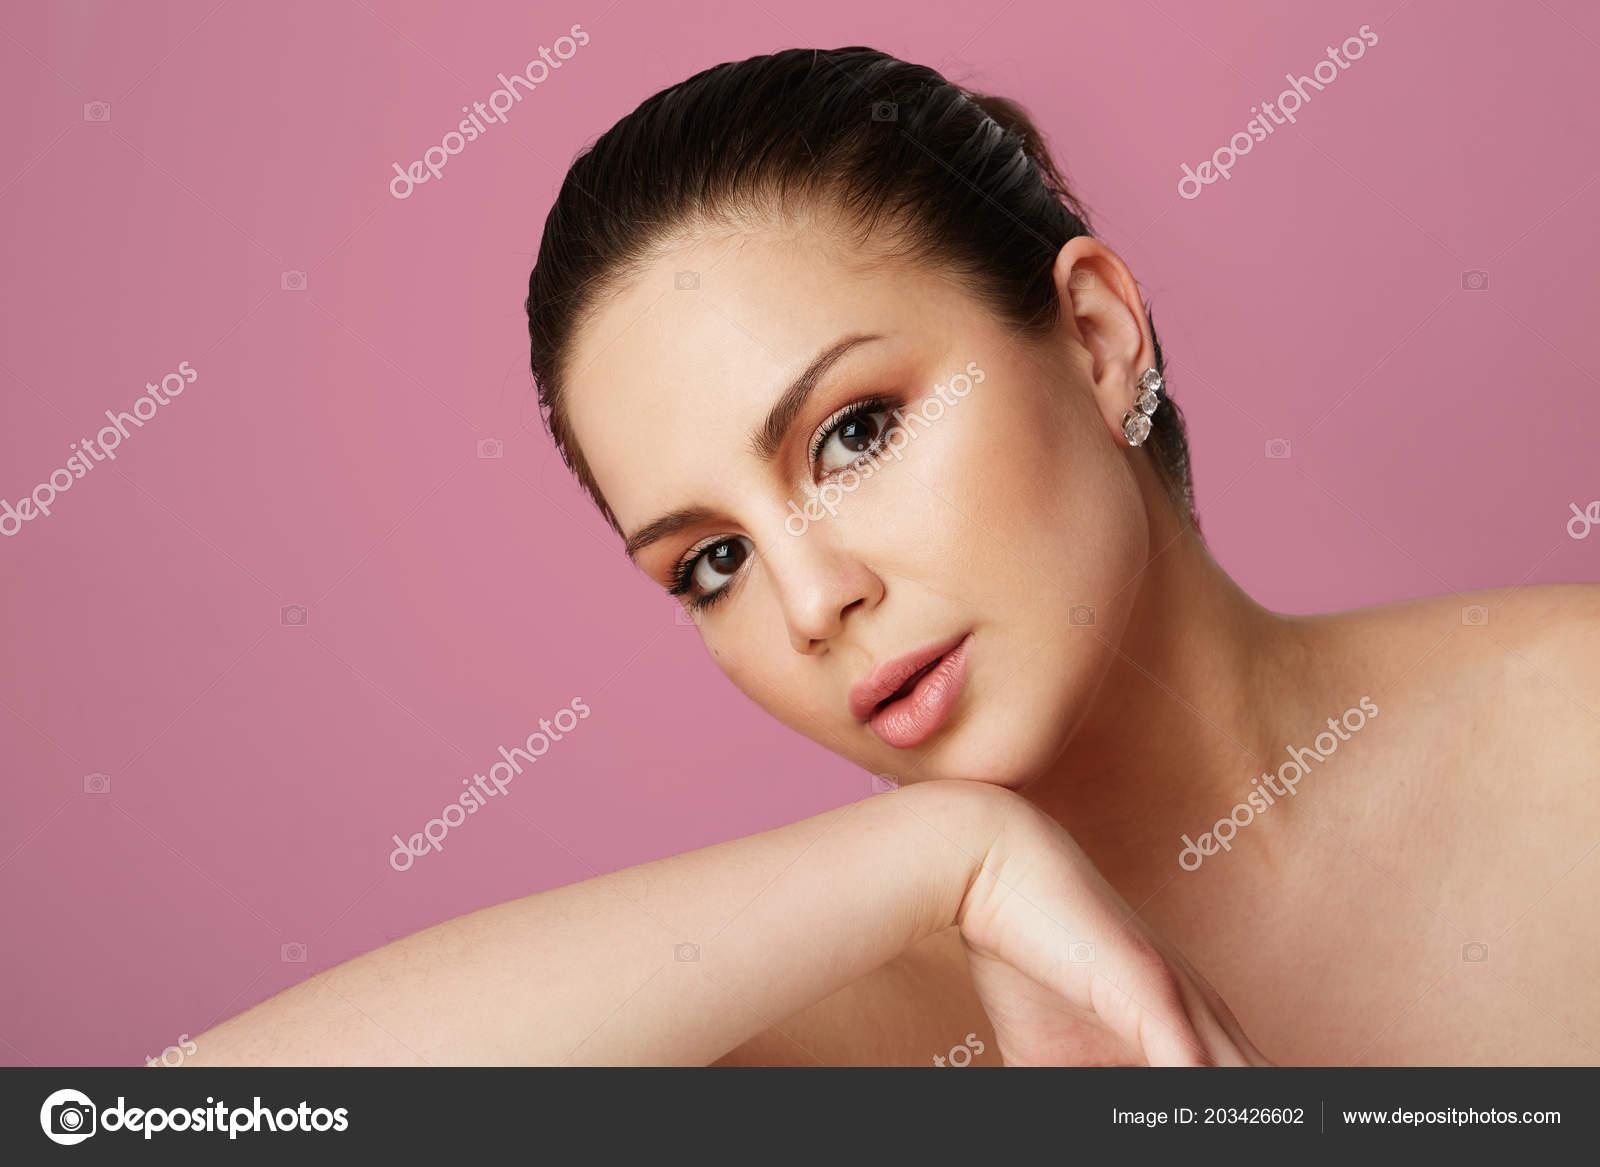 Tanushree duttw full naked